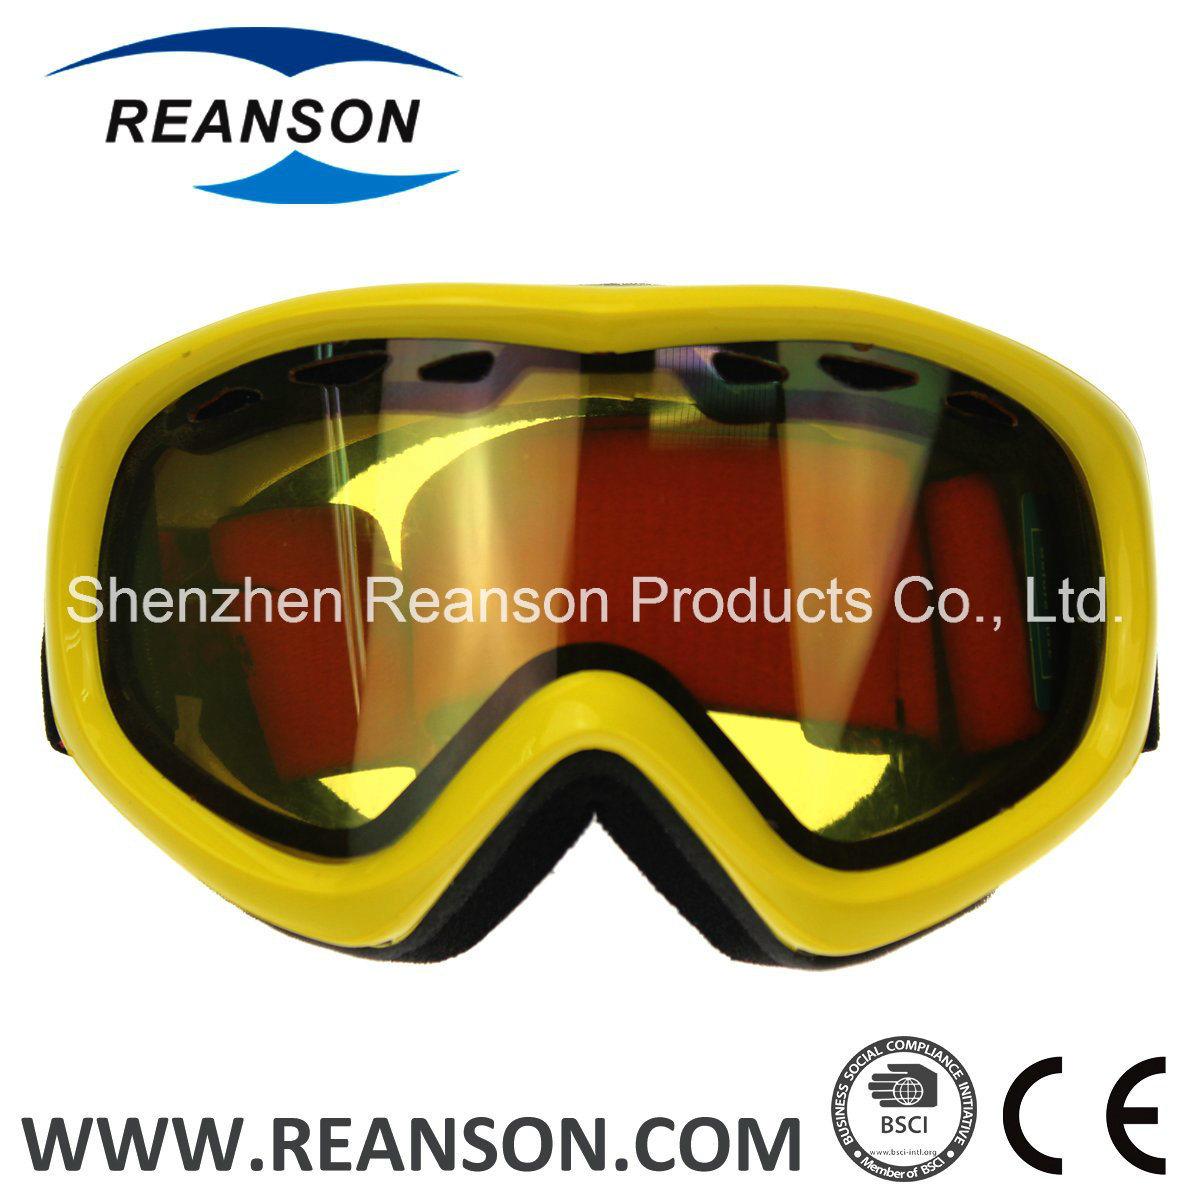 Reanson Professional OTG Anti-Fog Snow Mobile Goggles